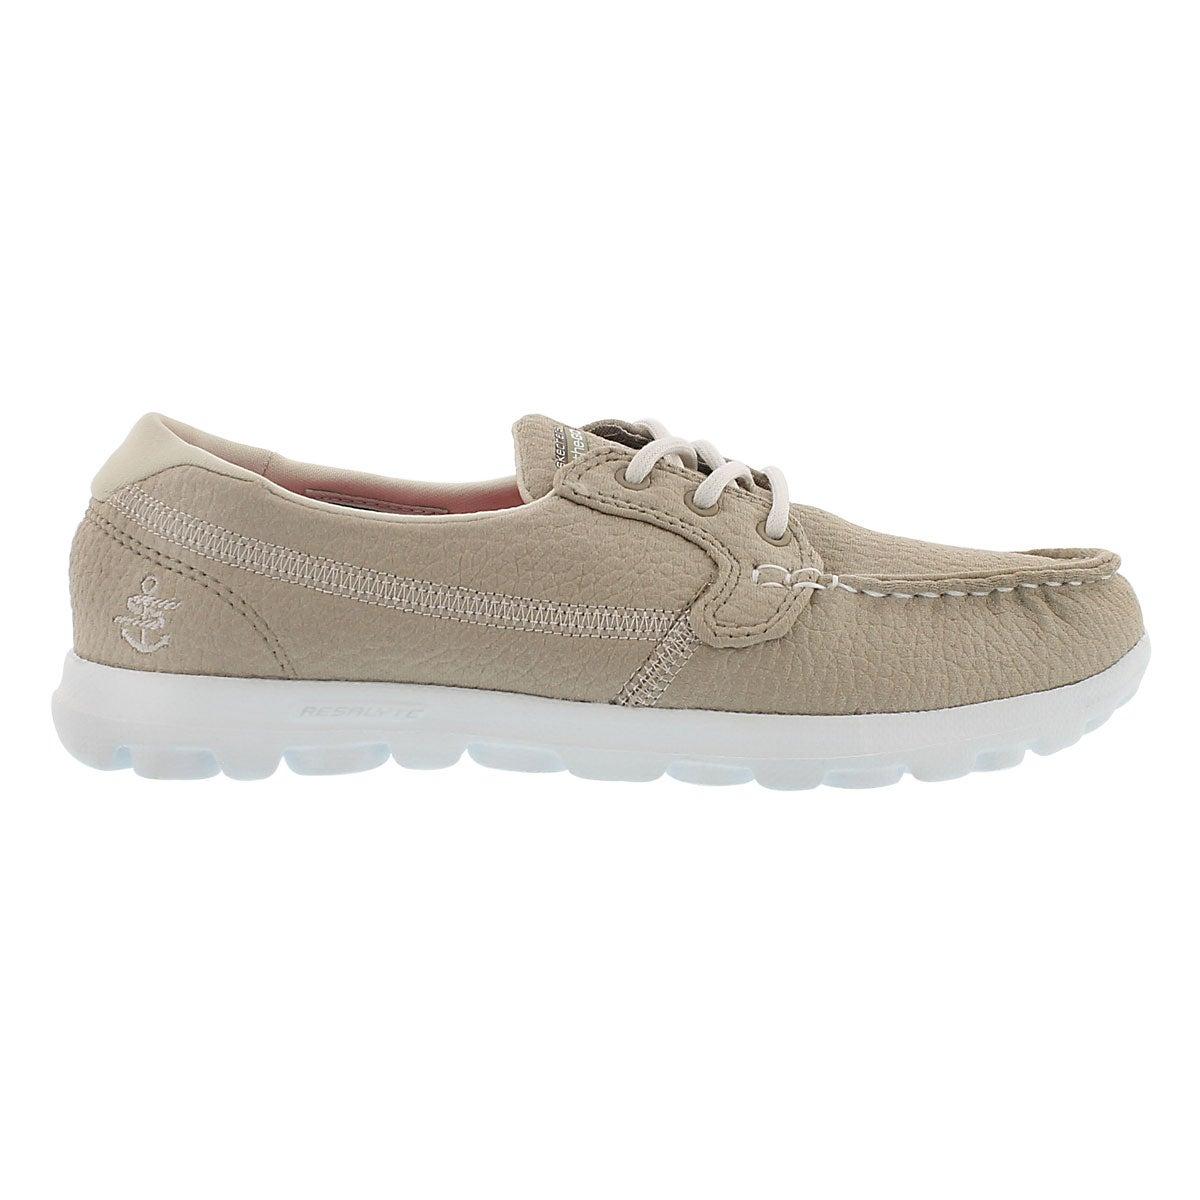 Lds Cruise natural 3 eye boat shoe